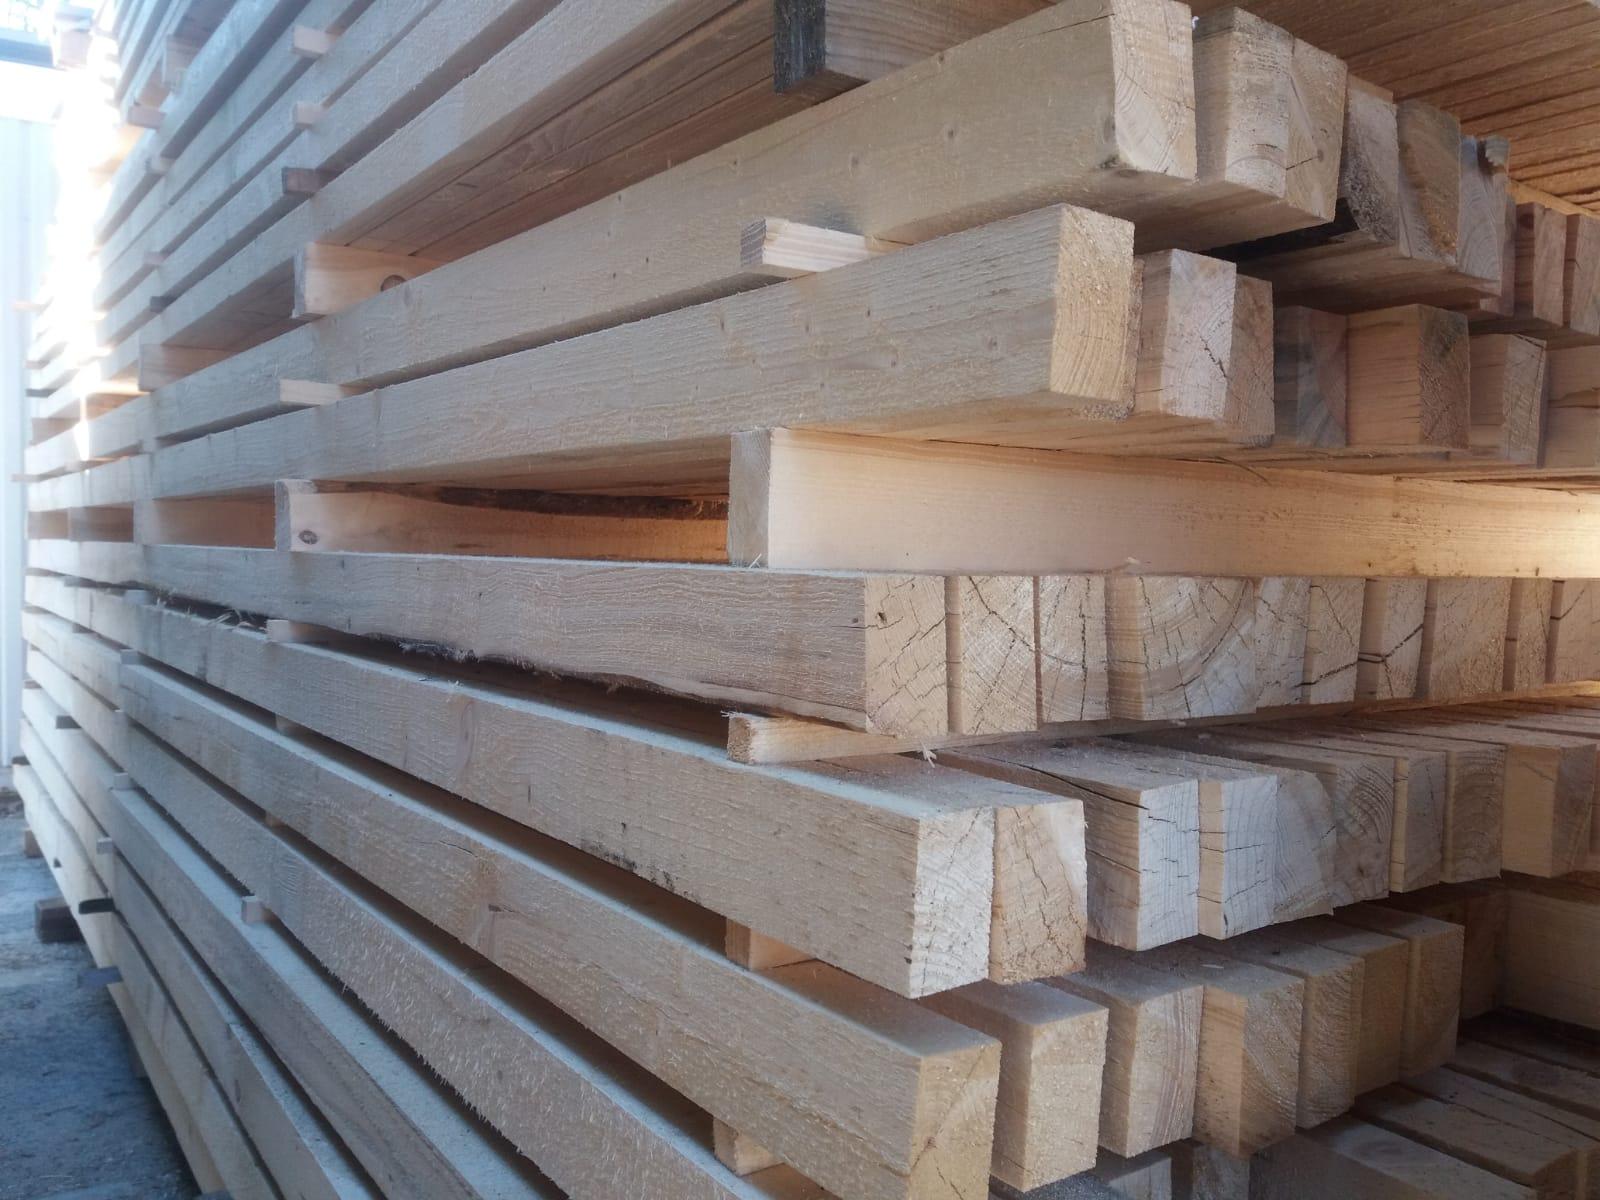 fichten-staffeln-5x8x400cm